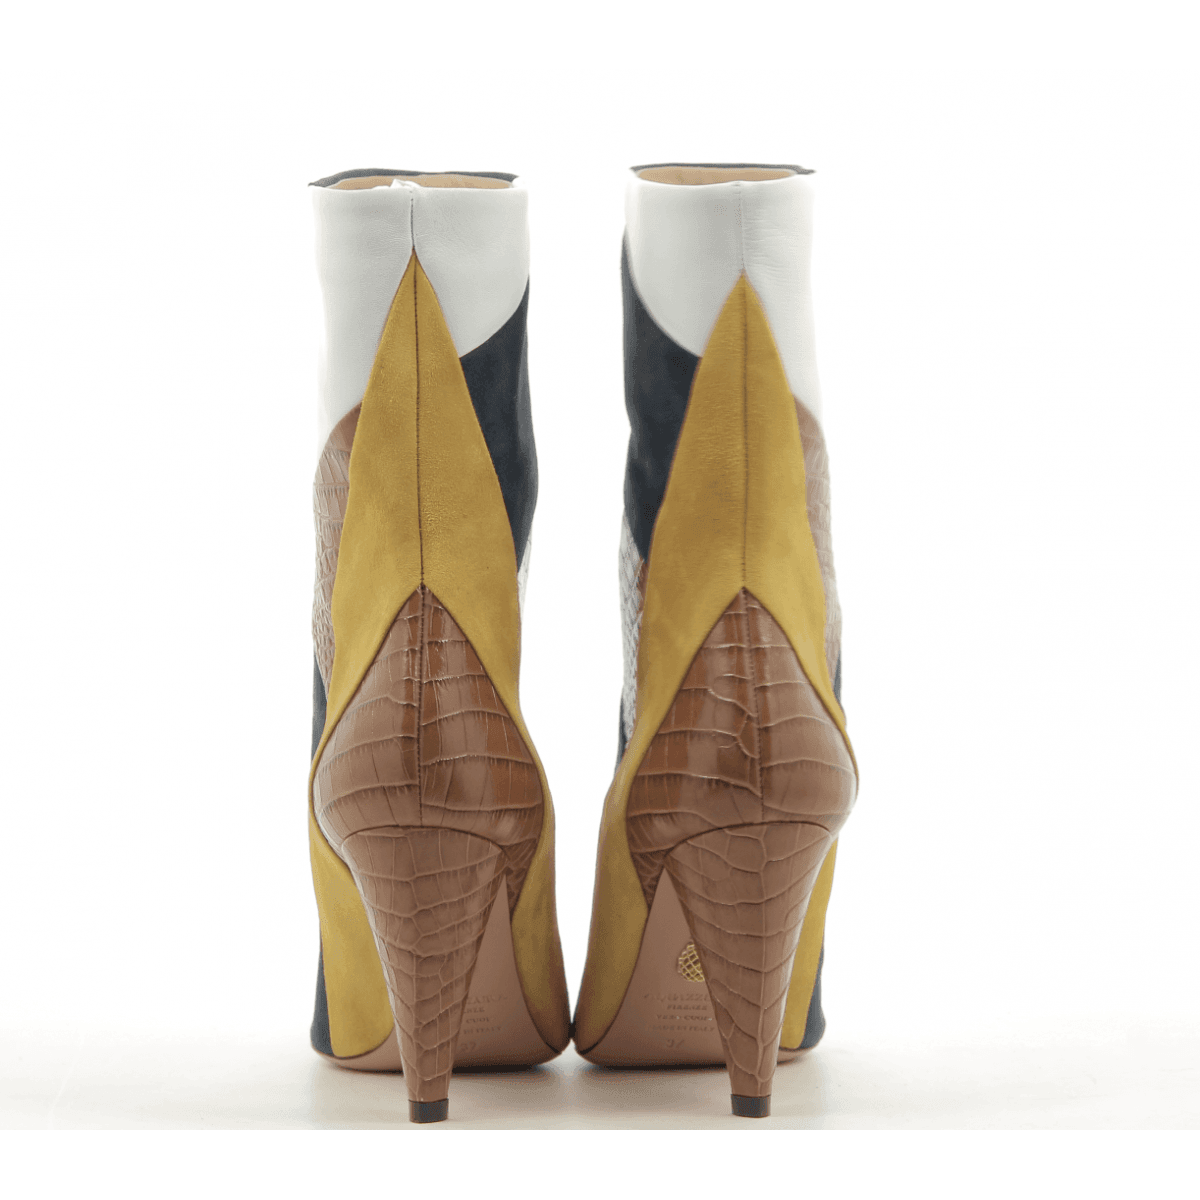 Bottines en patchwork de cuir et tige ample Aquazzura - CALDER BOOTIE85